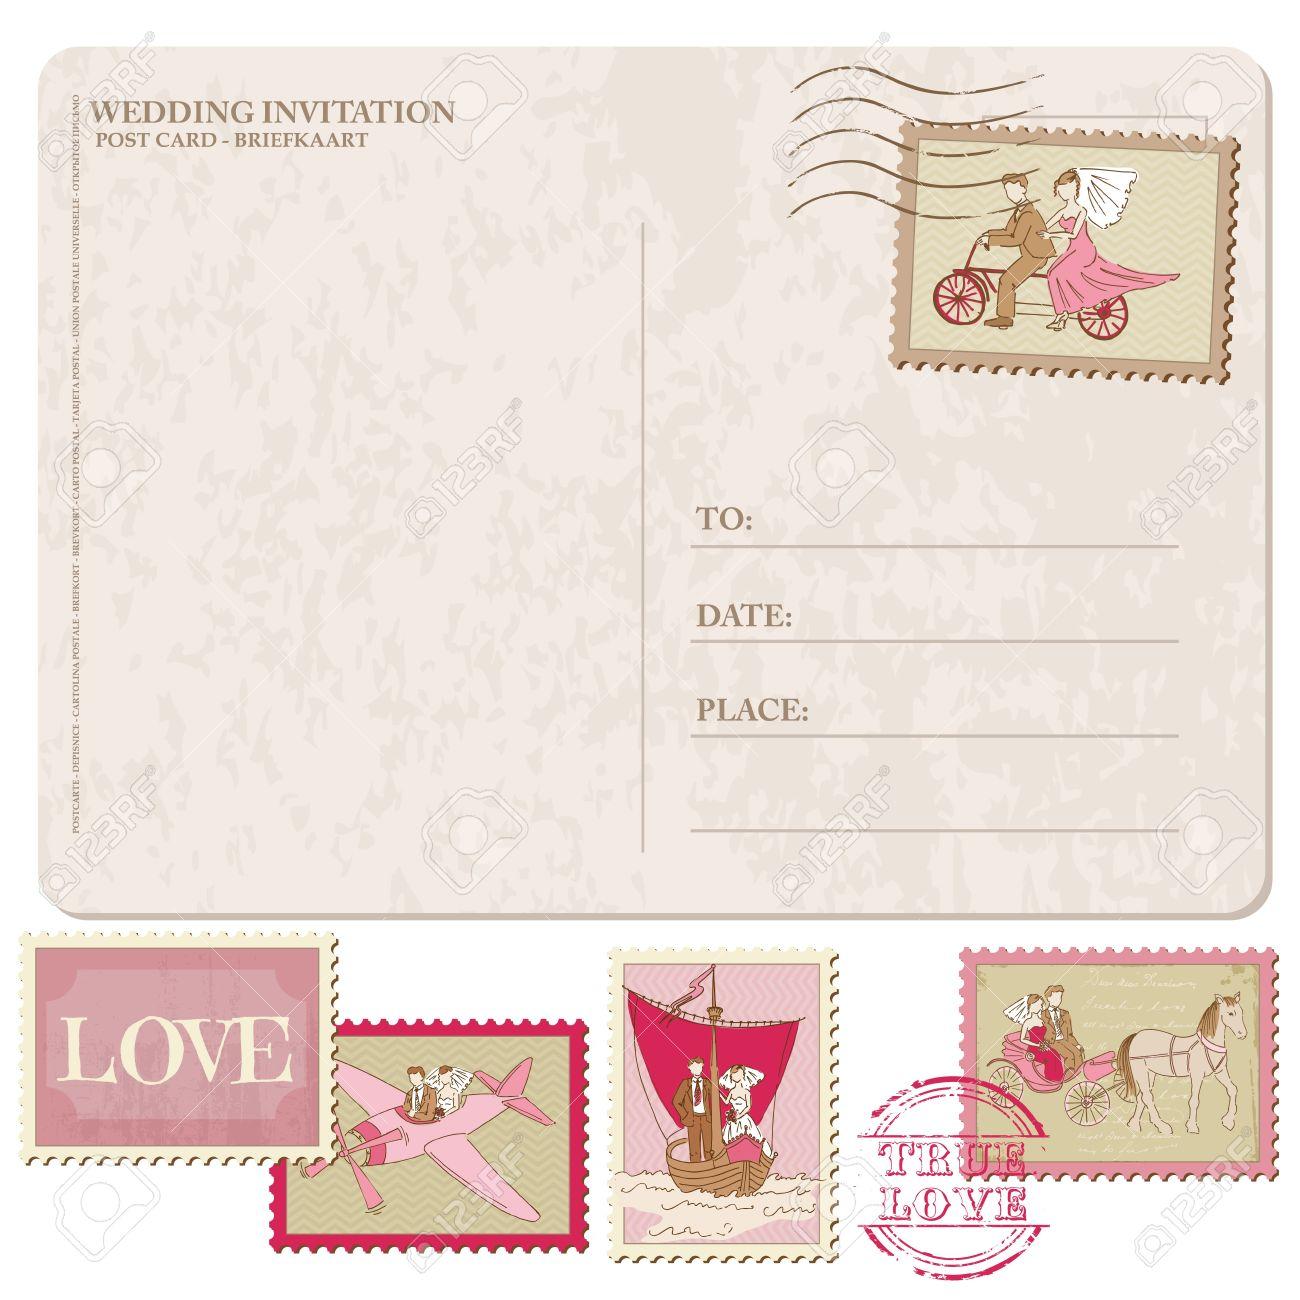 wedding invitation vintage postcard with postage stamps for